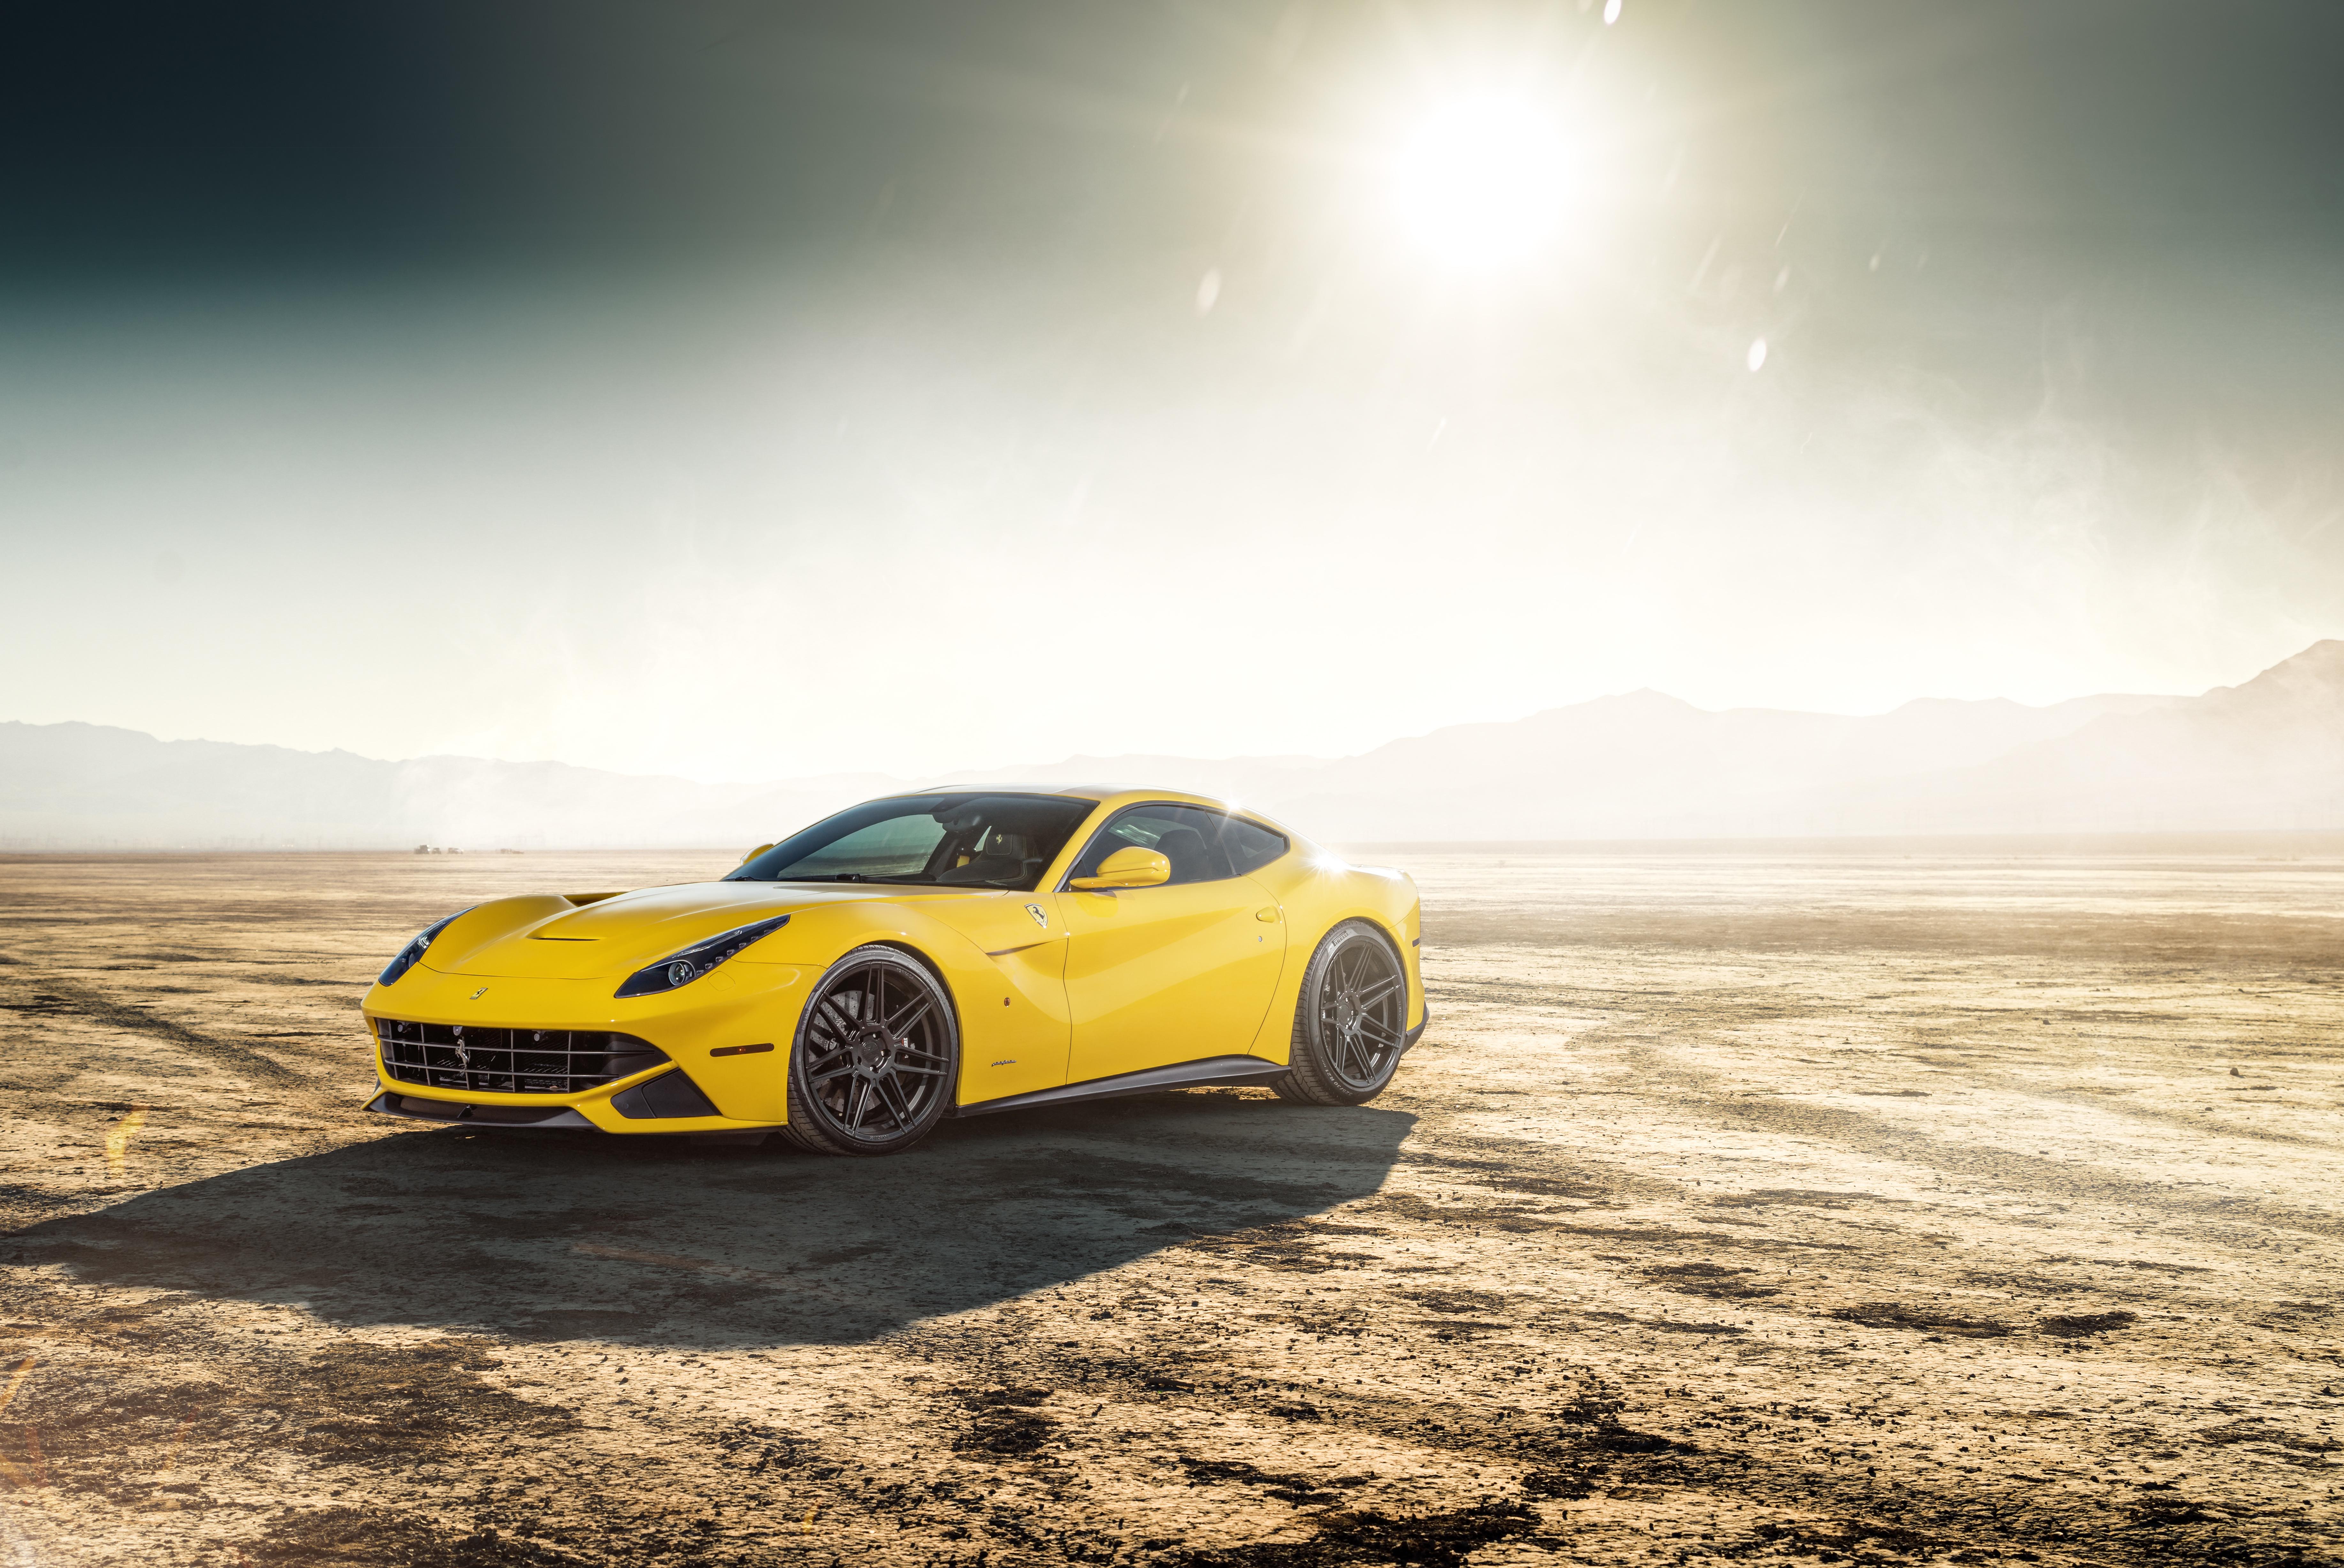 желтый спортивный автомобиль Ferrari F12 Berlinetta Wheelsandmore  № 1564304 загрузить